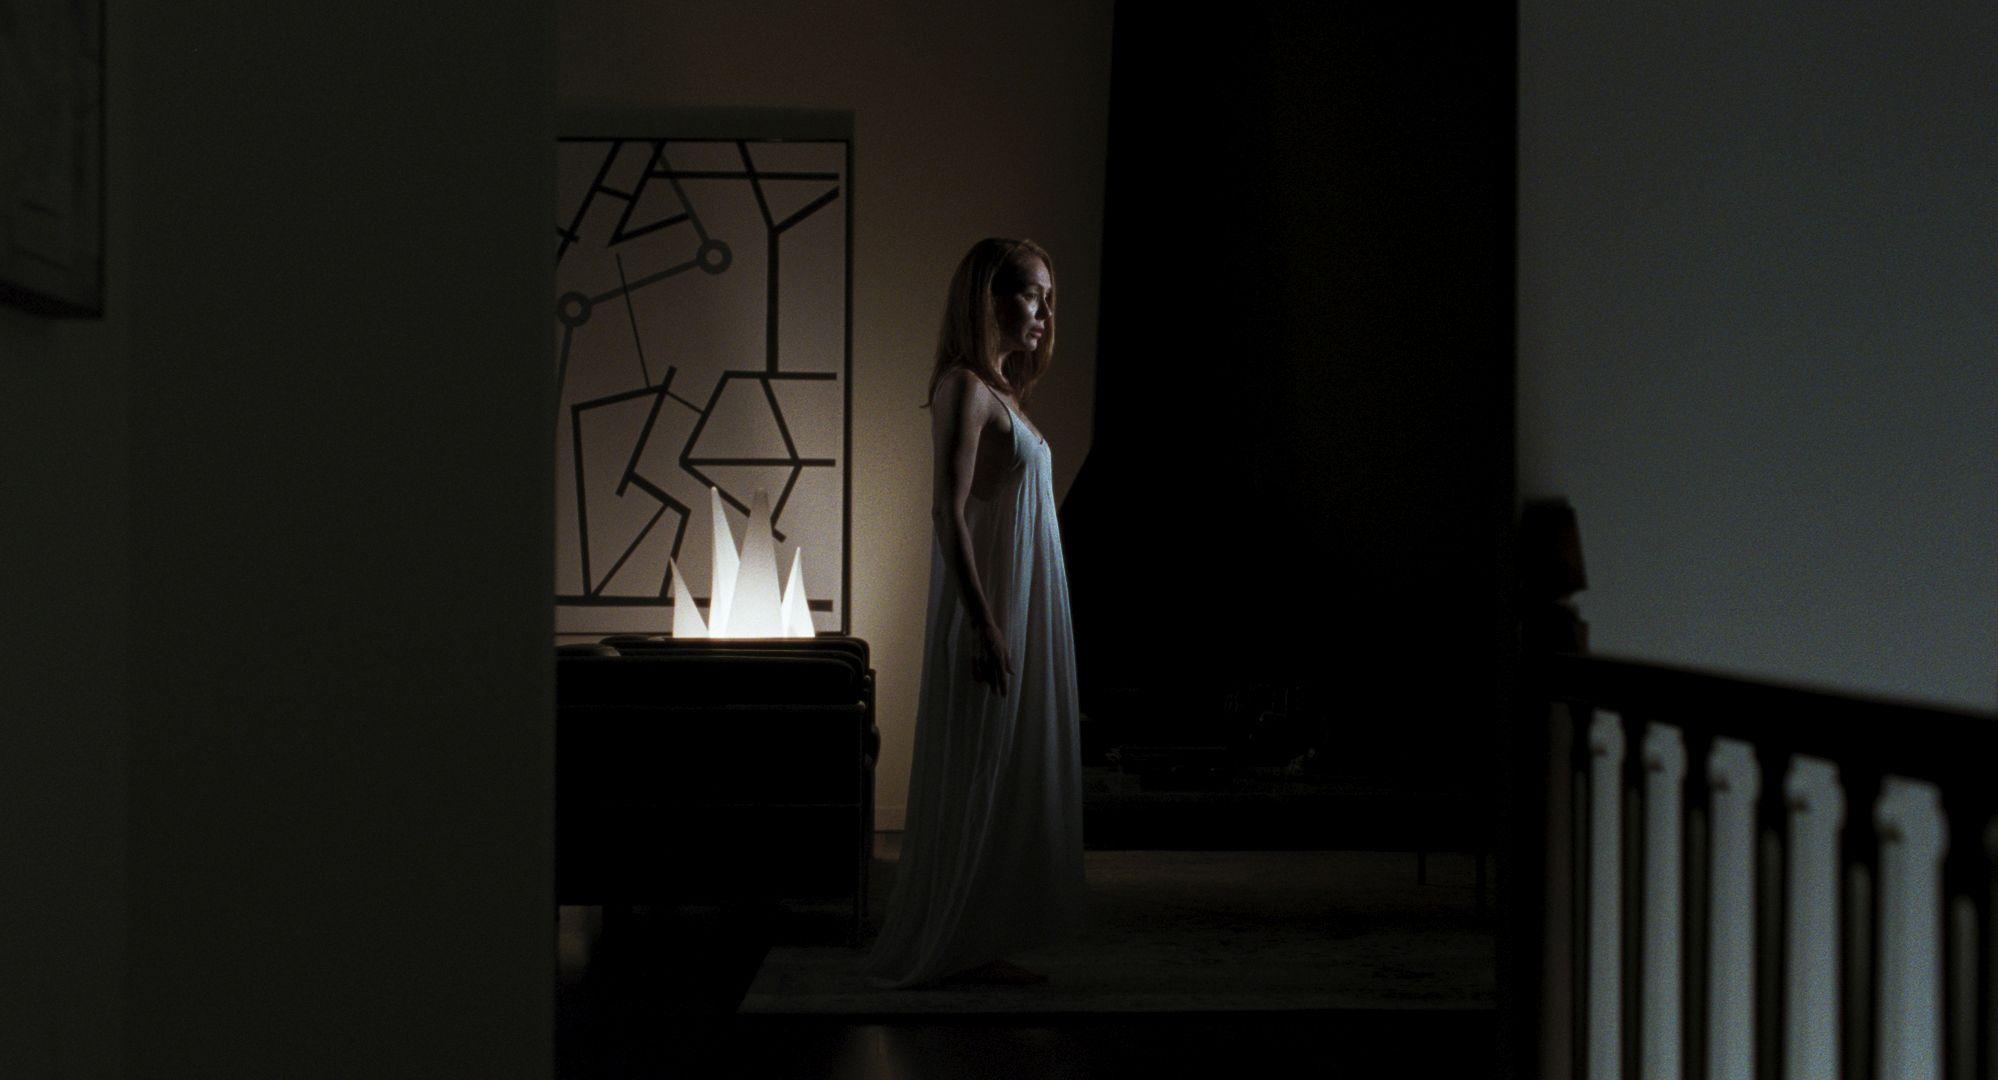 Boris Sans Béatrice - Simone-Élise Girard vaga per la casa in camicia da notte